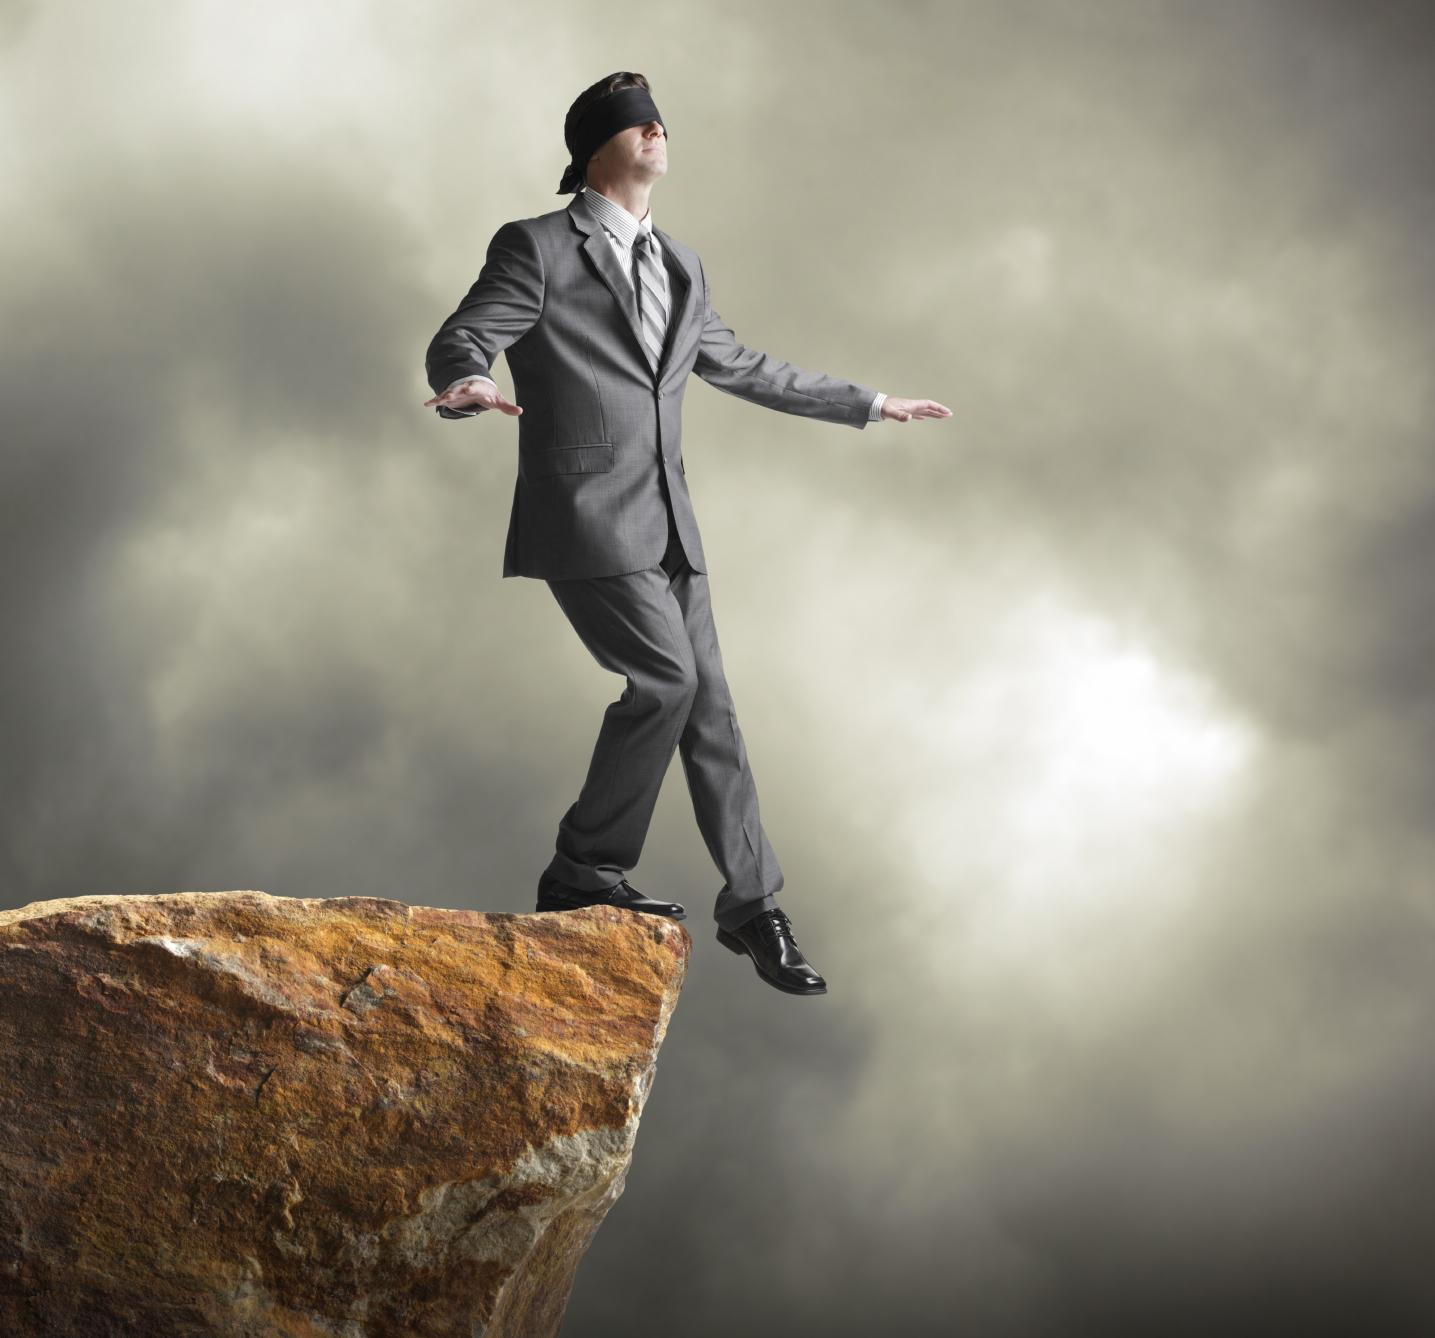 sinful man on a cliff에 대한 이미지 검색결과